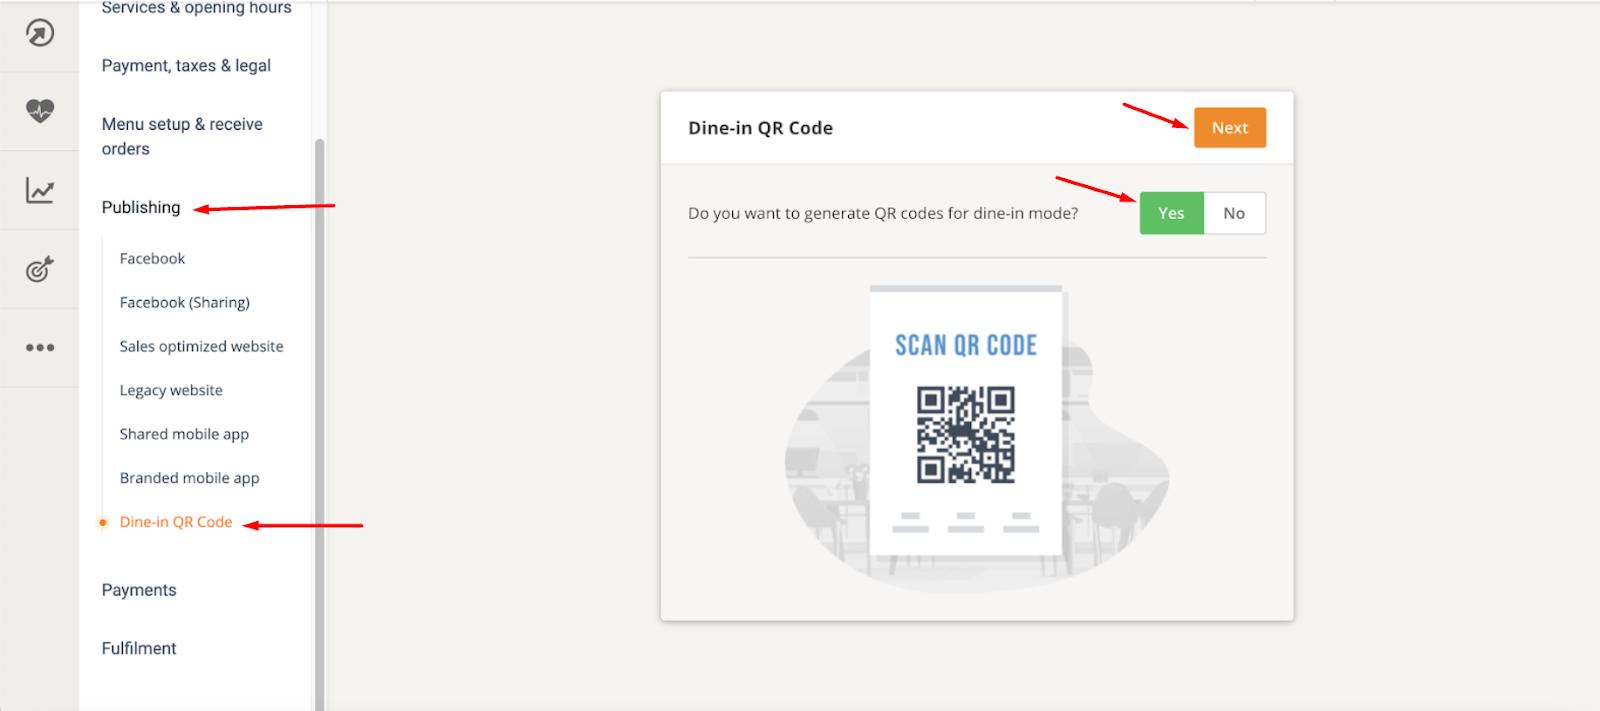 qr code menu app for restaurants